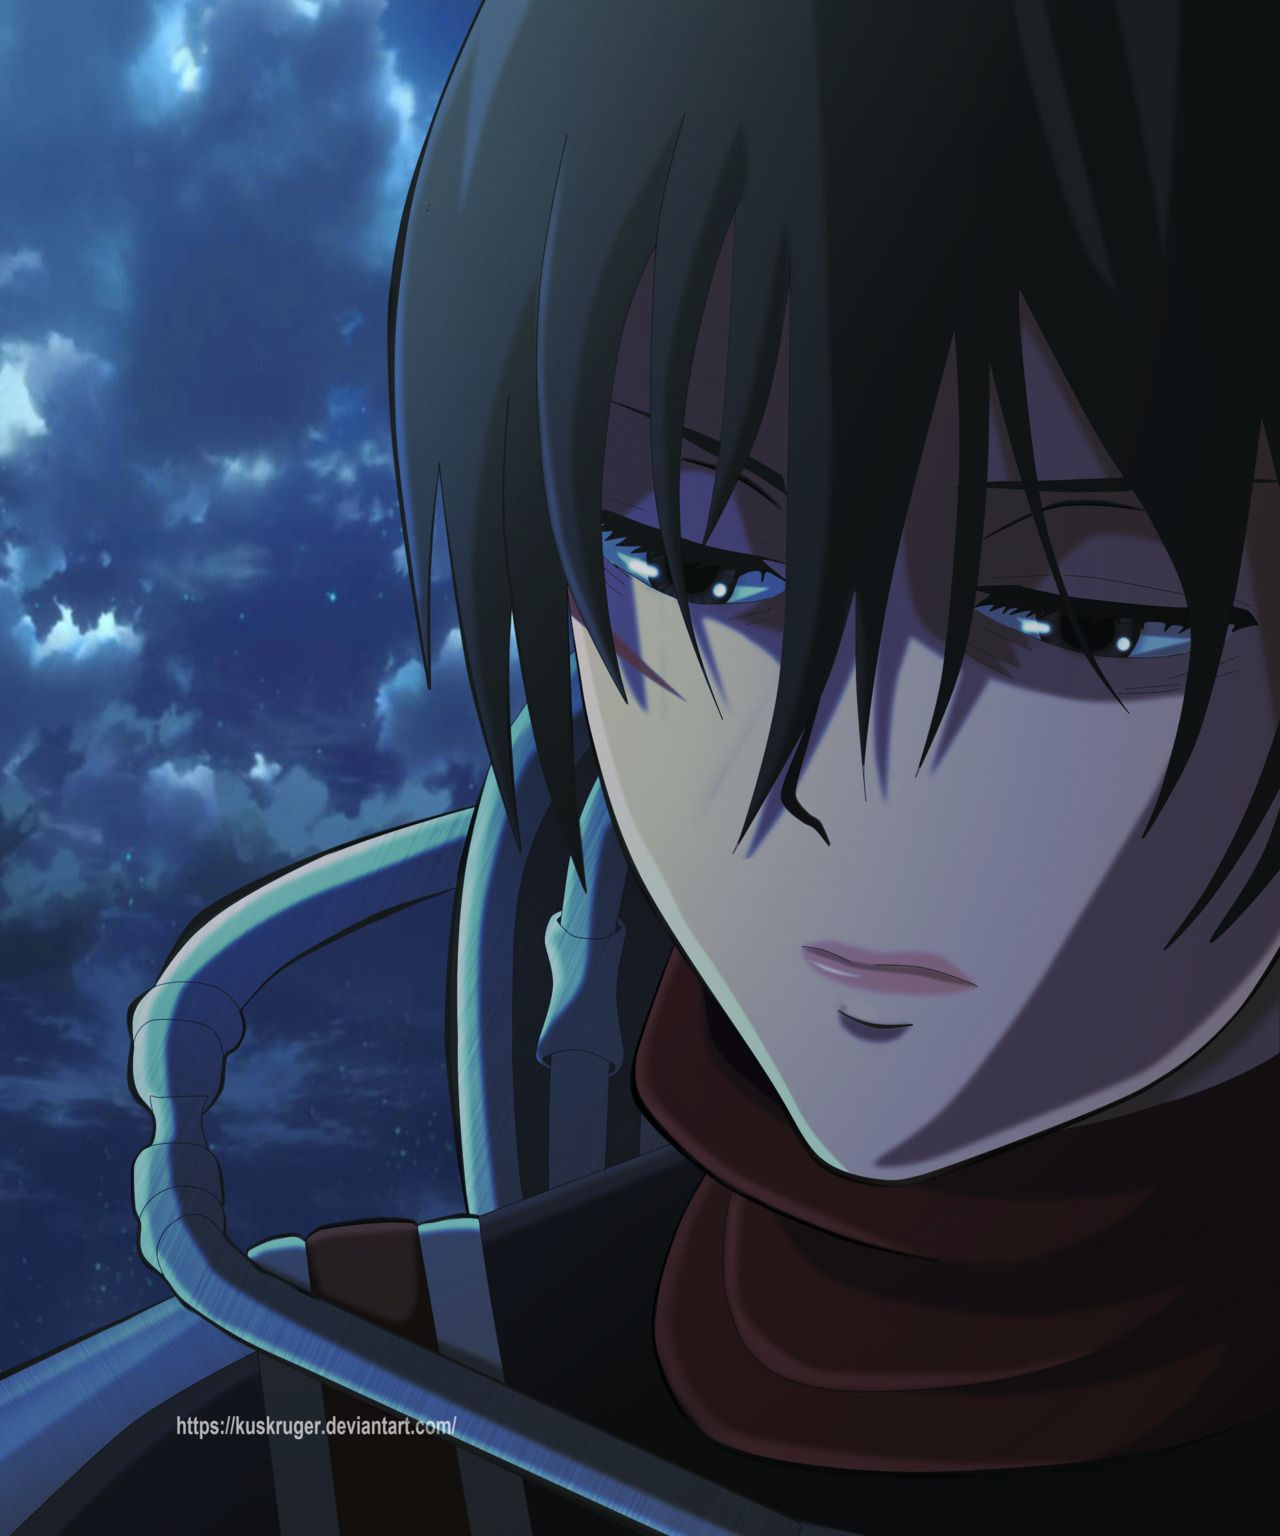 Mikasa | Chapter 104 | Mikasa Ackerman | Attack on titan, Attack on